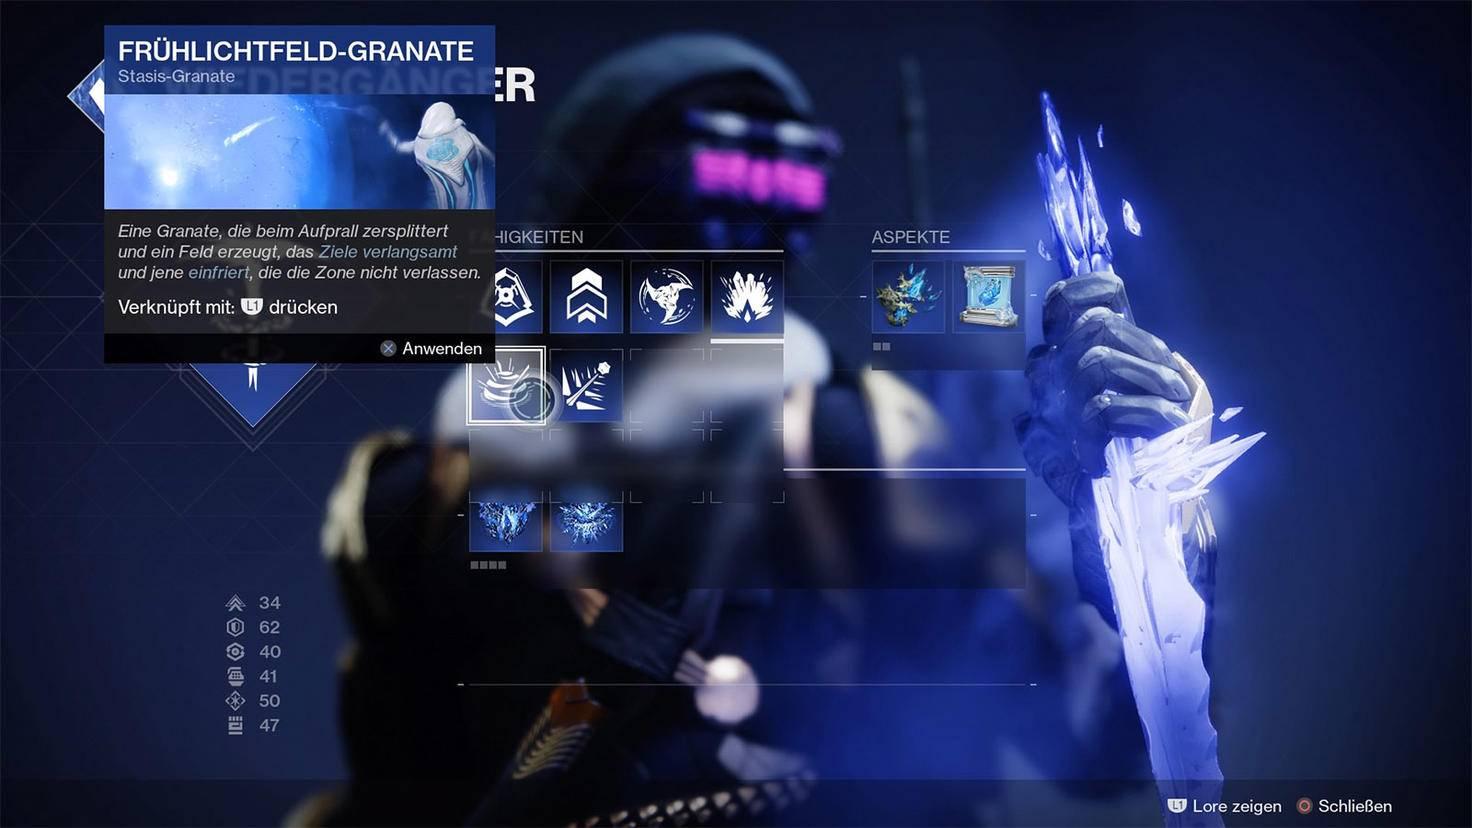 Destiny 2 Stasis Frühlichtfeld-Granate